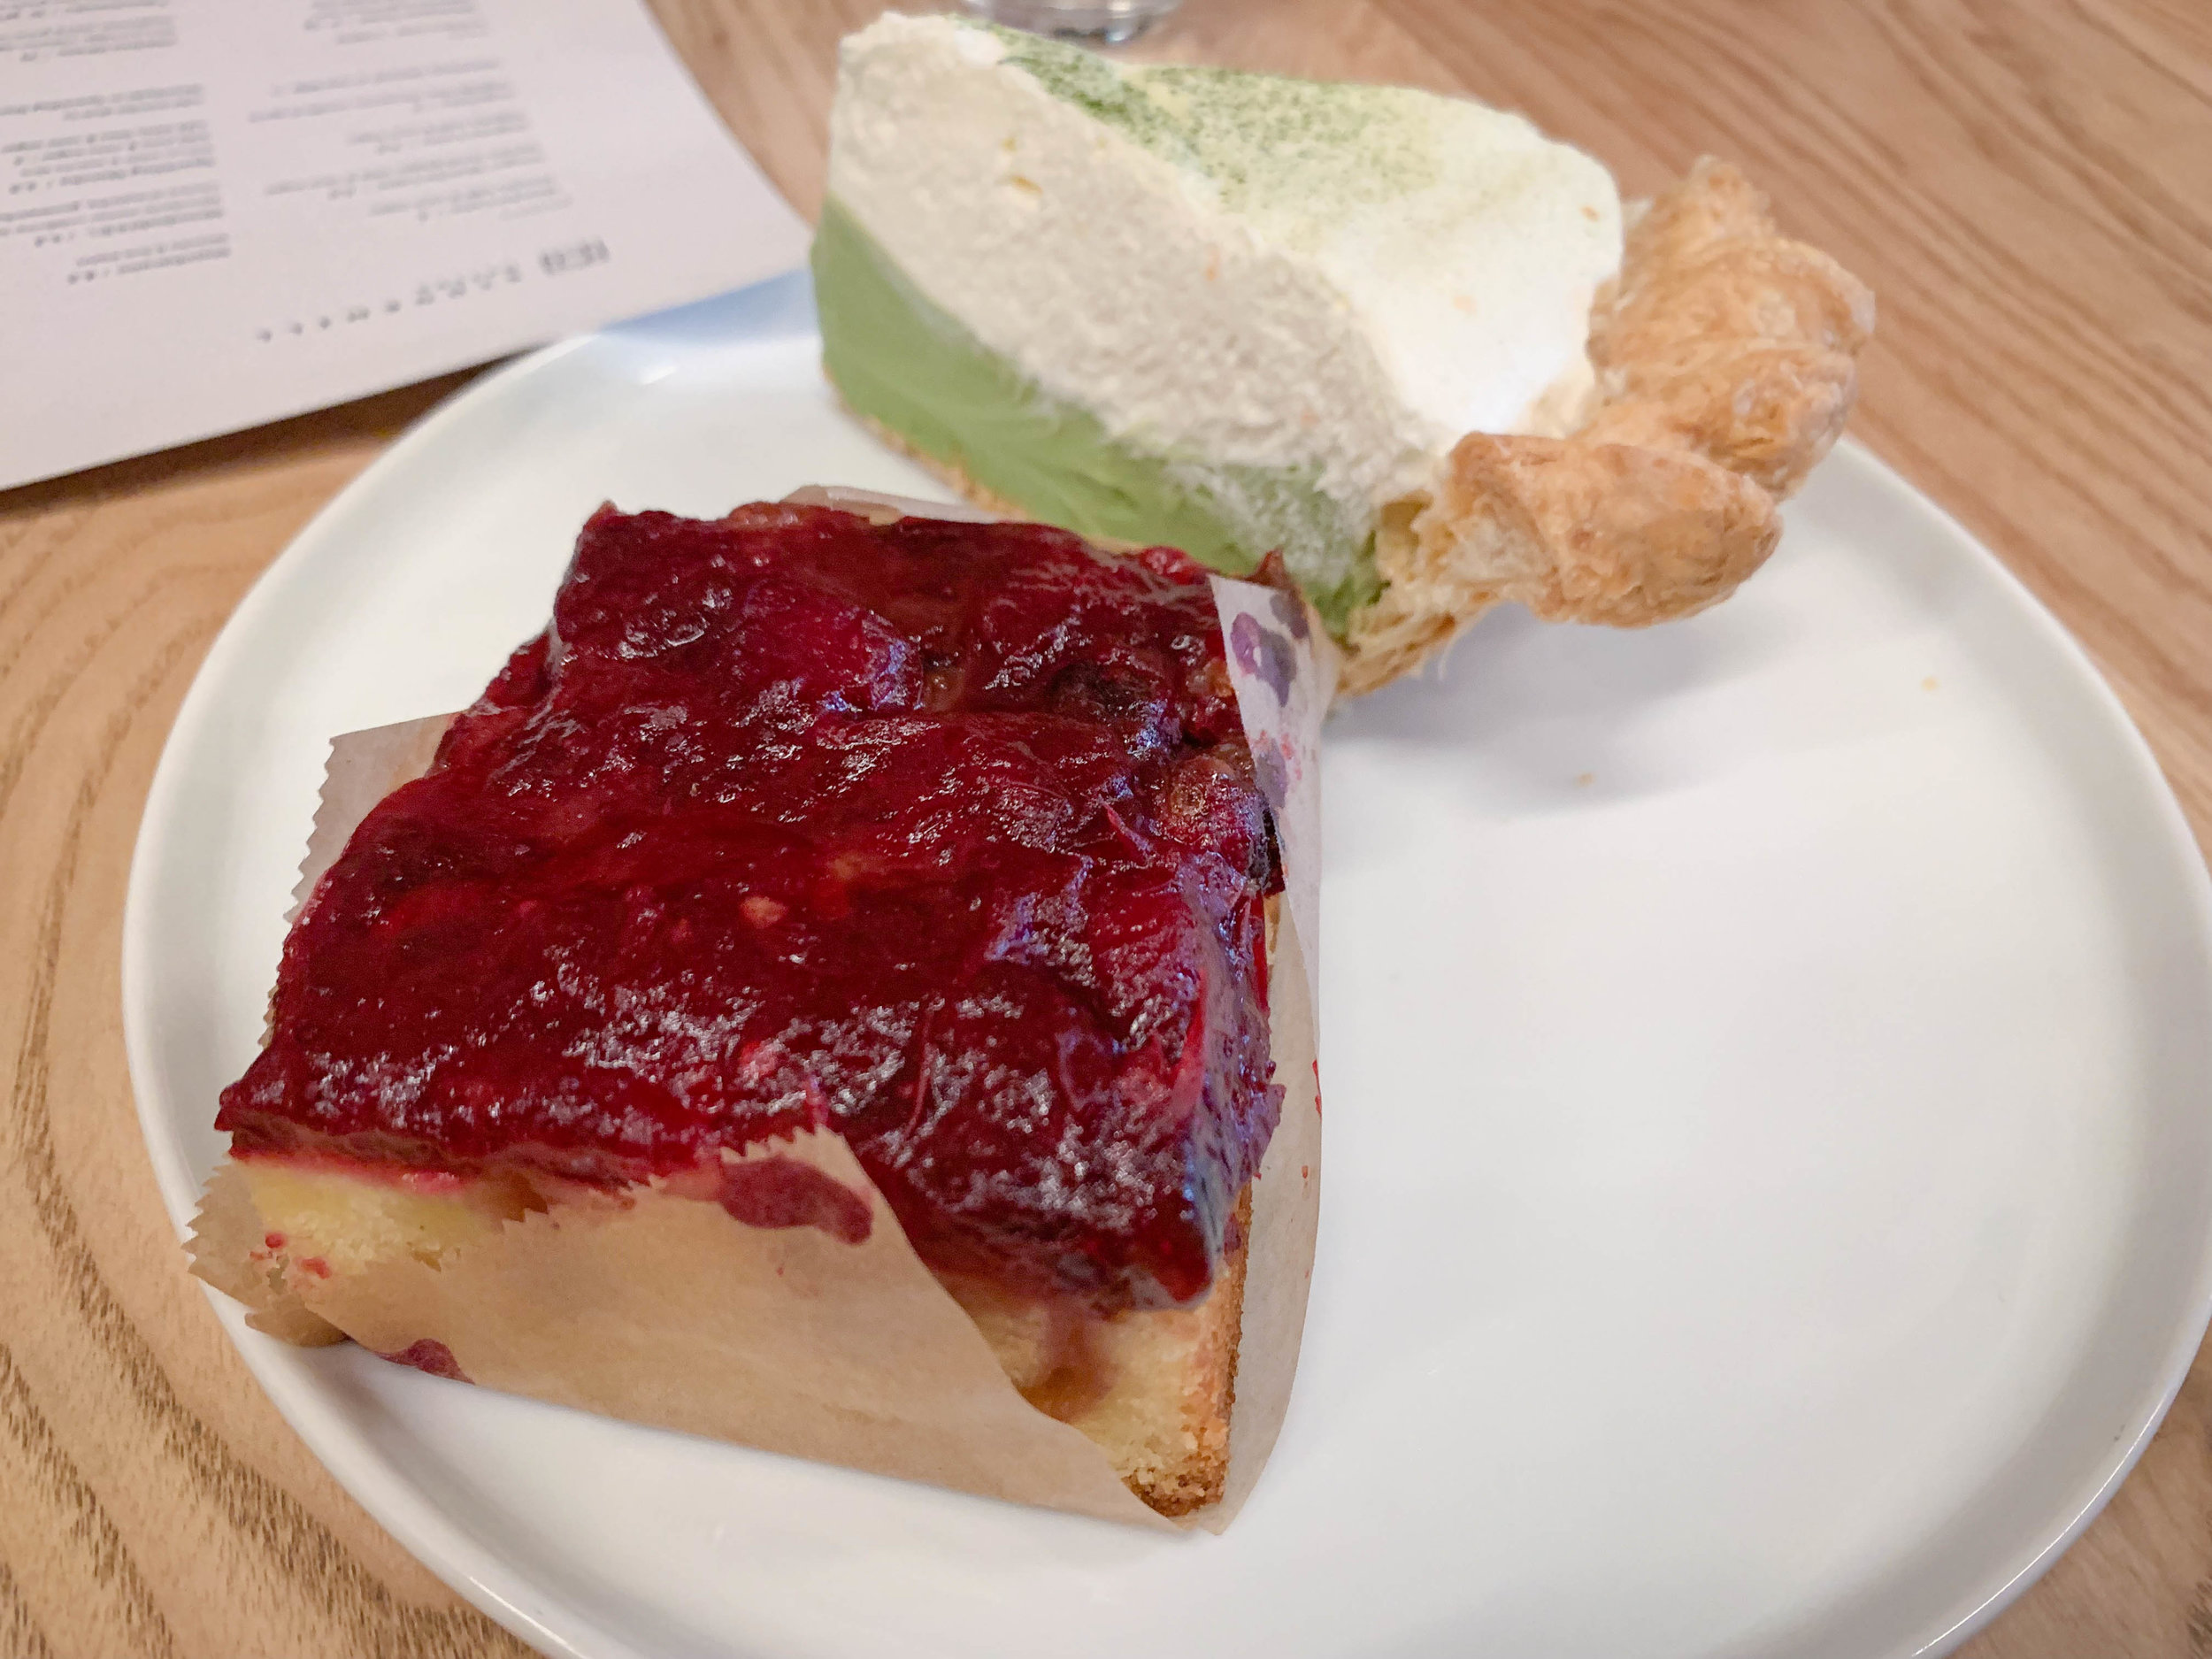 Cranberry coffee cake and matcha cream pie